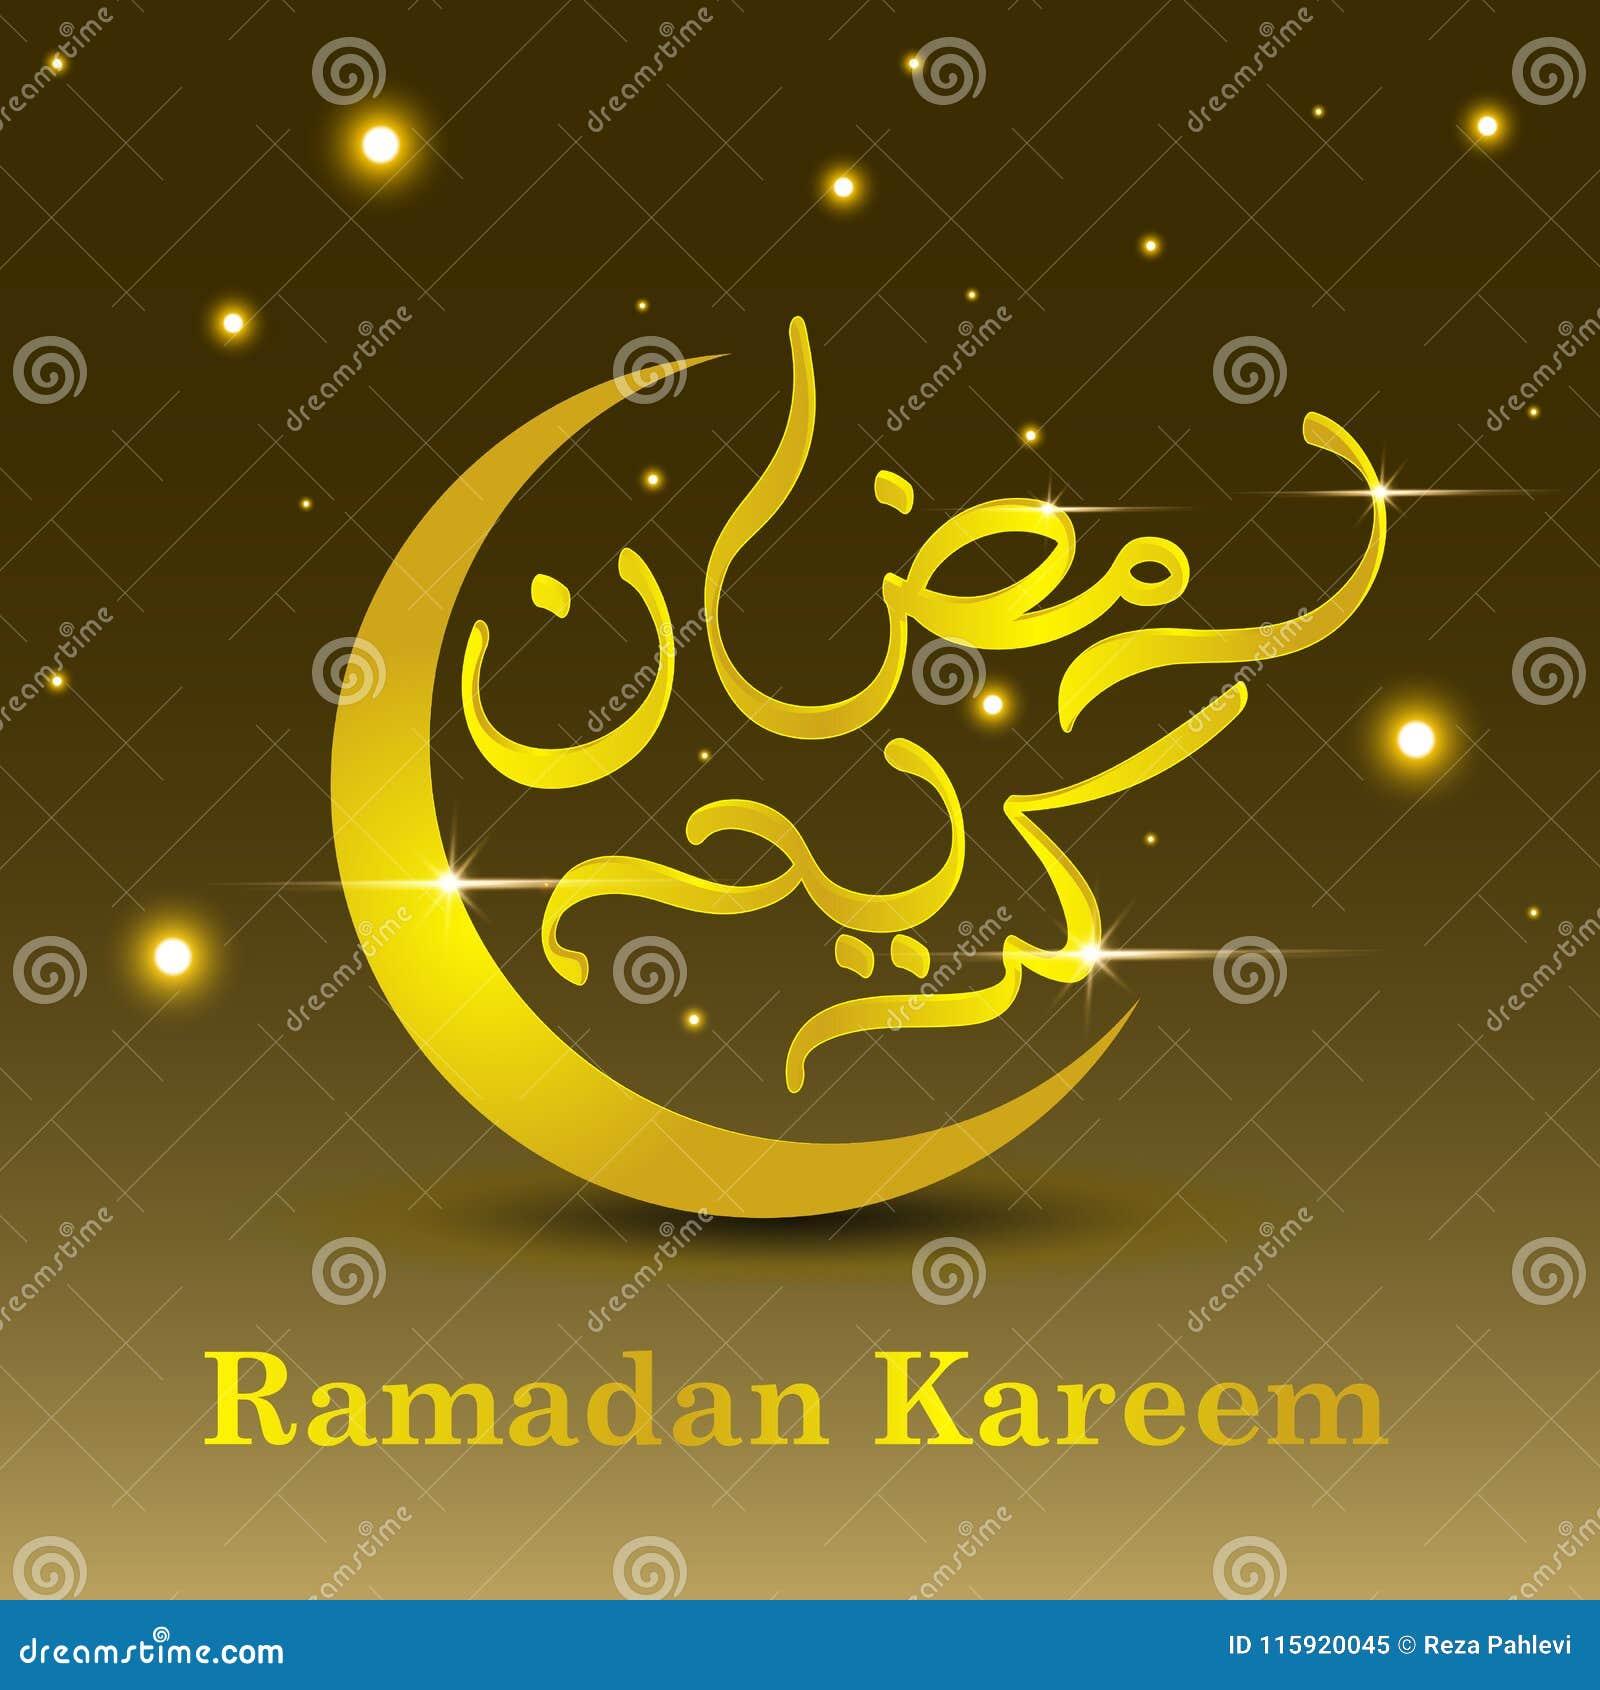 Ramadan Kareem Islamic Illustration Greeting Design Mosque Dome